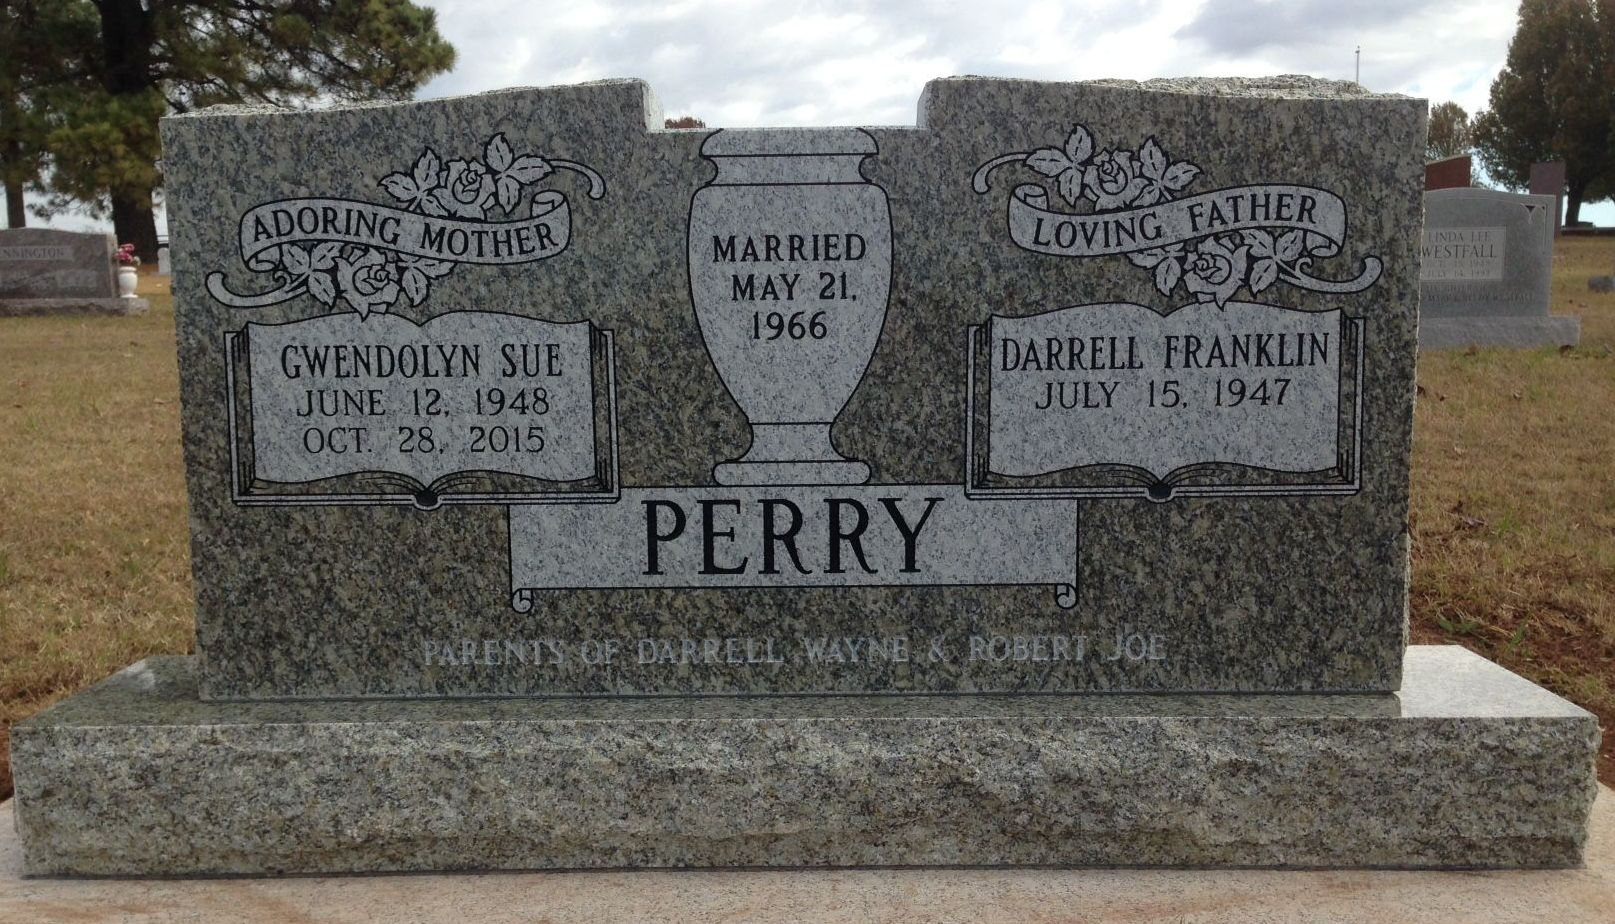 Perry2 - Carney.jpg